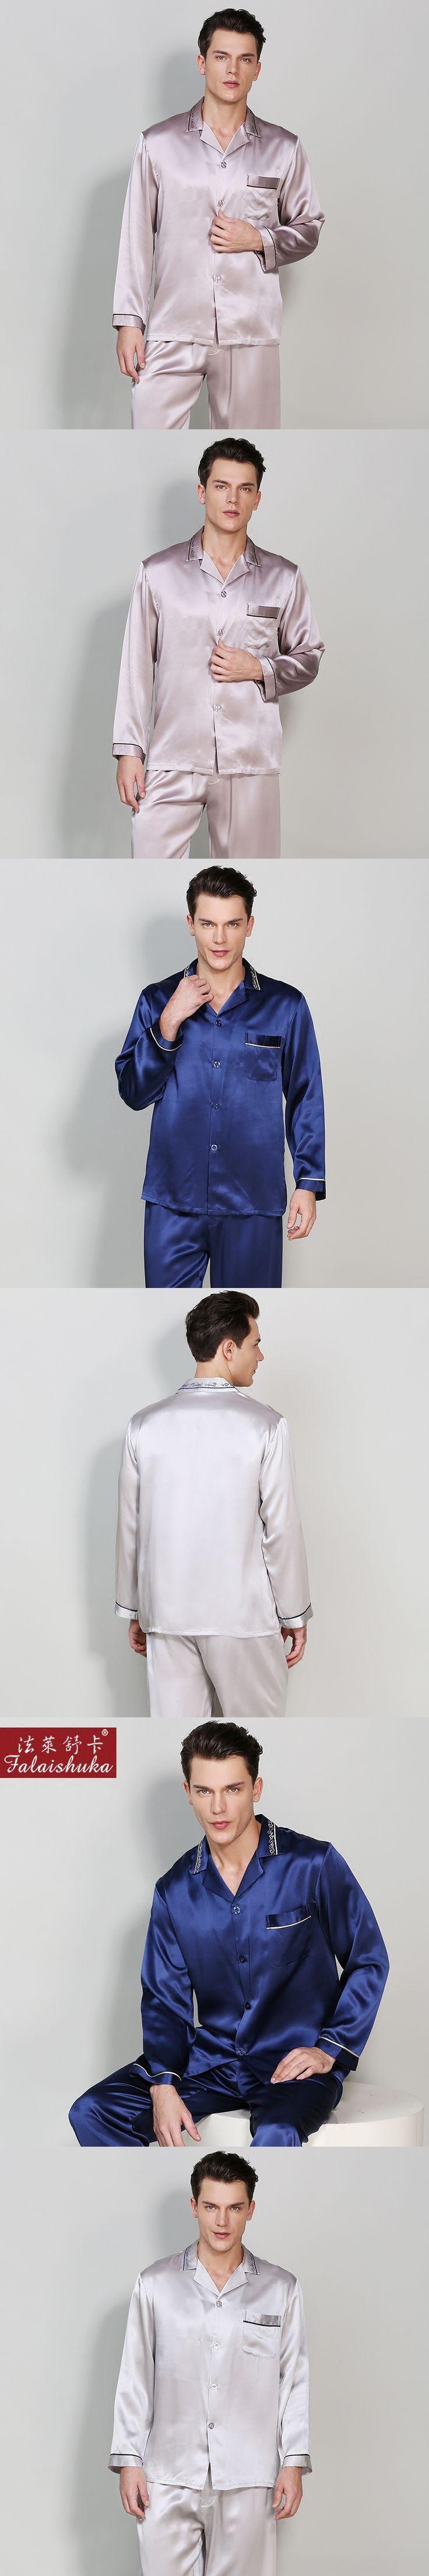 100% Silk Stain Men's Pajamas sets2017Autumn solid chinese style Long-Sleeve Male Pajama Pants Sets Blue Silk Pyjama Sleepwear